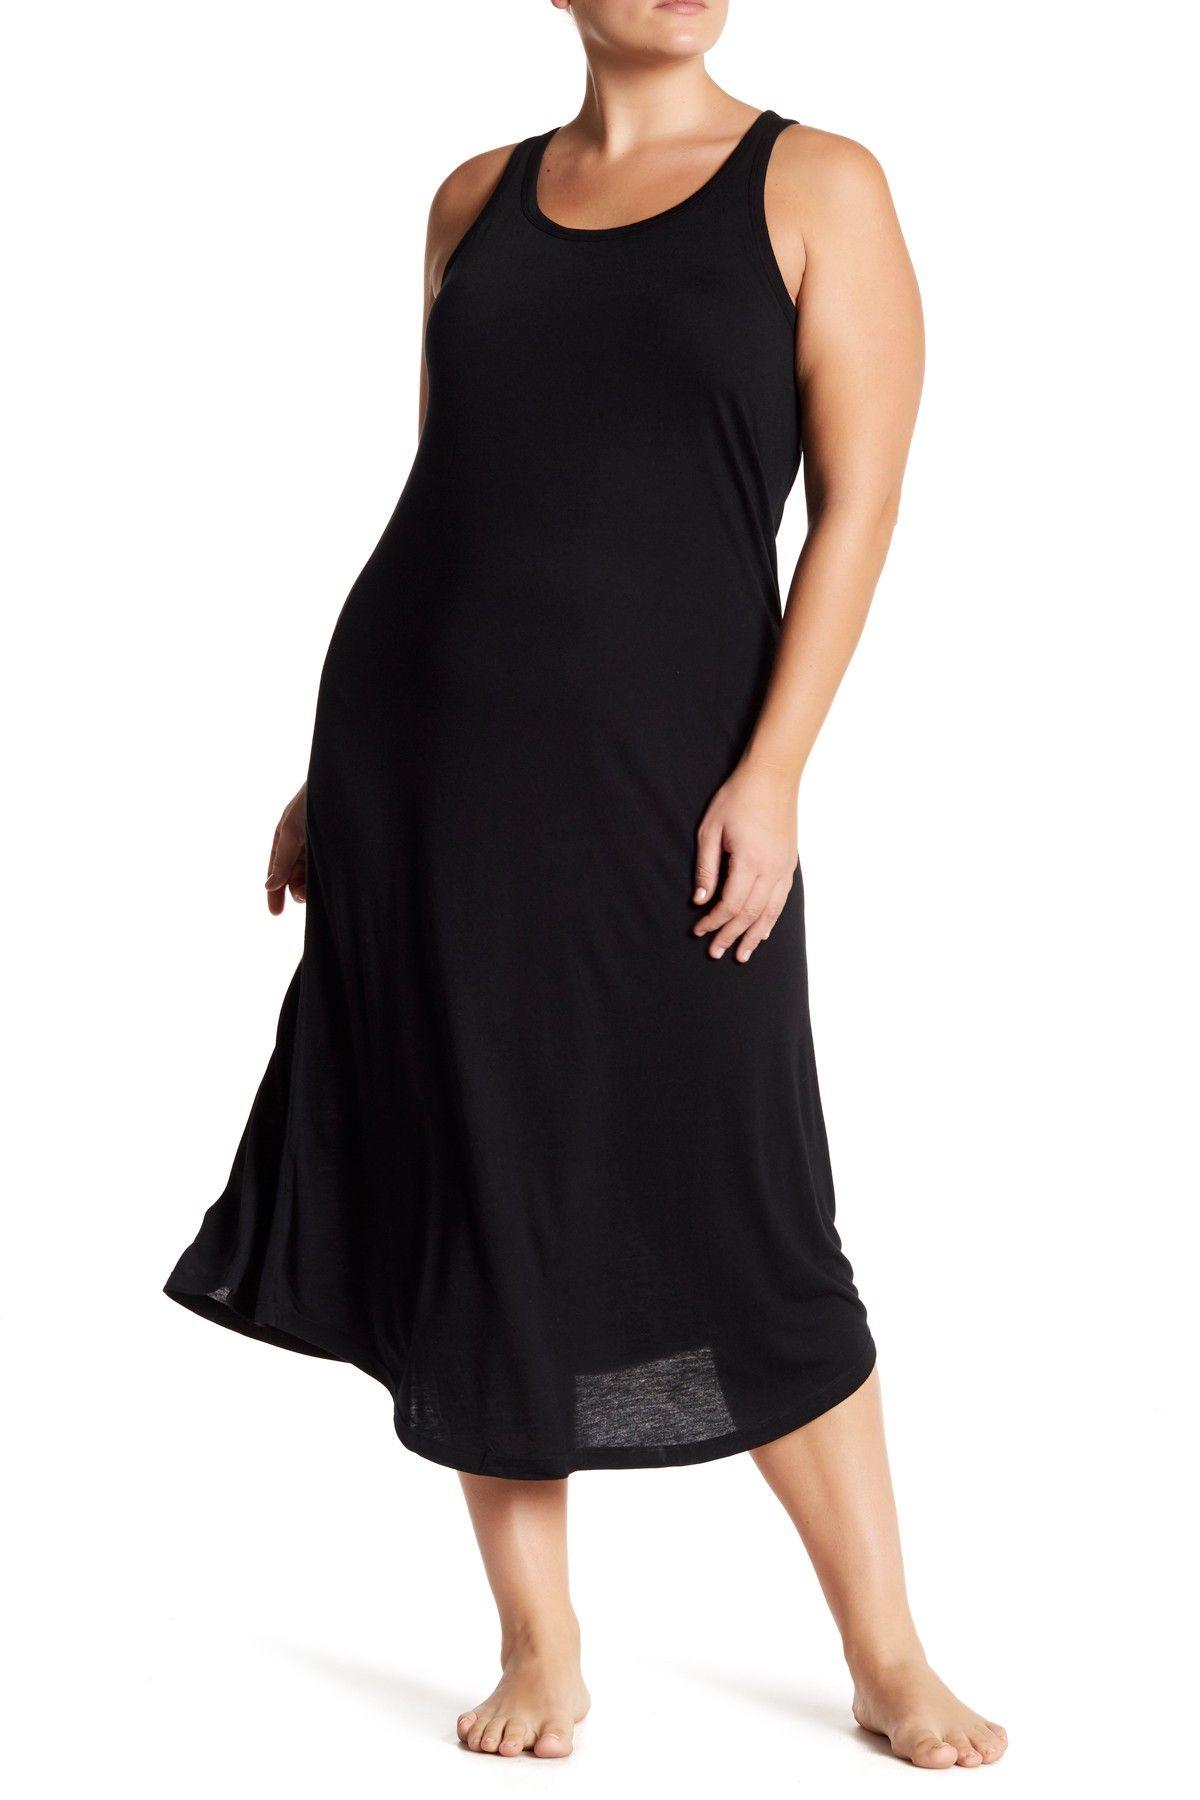 fortably you Sleeveless Sleep Maxi Dress Plus Size